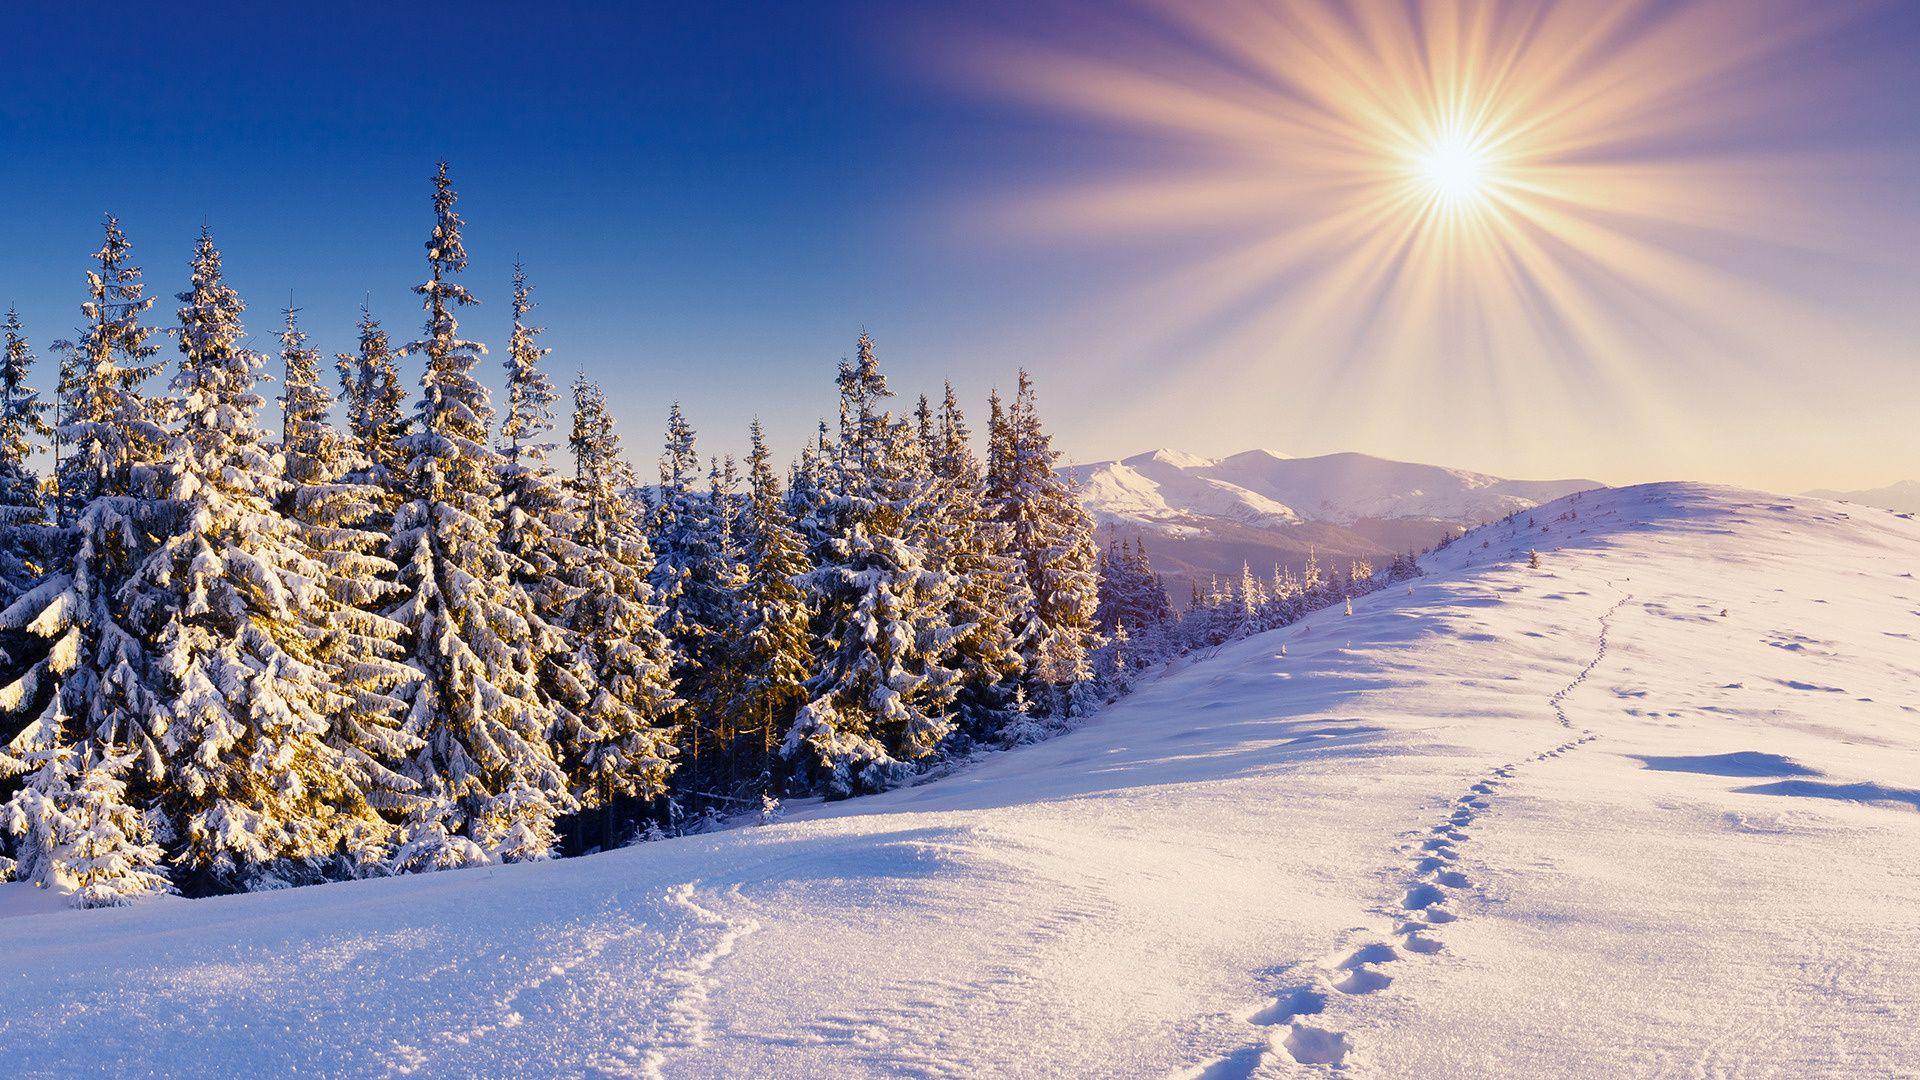 winter mountains 29618